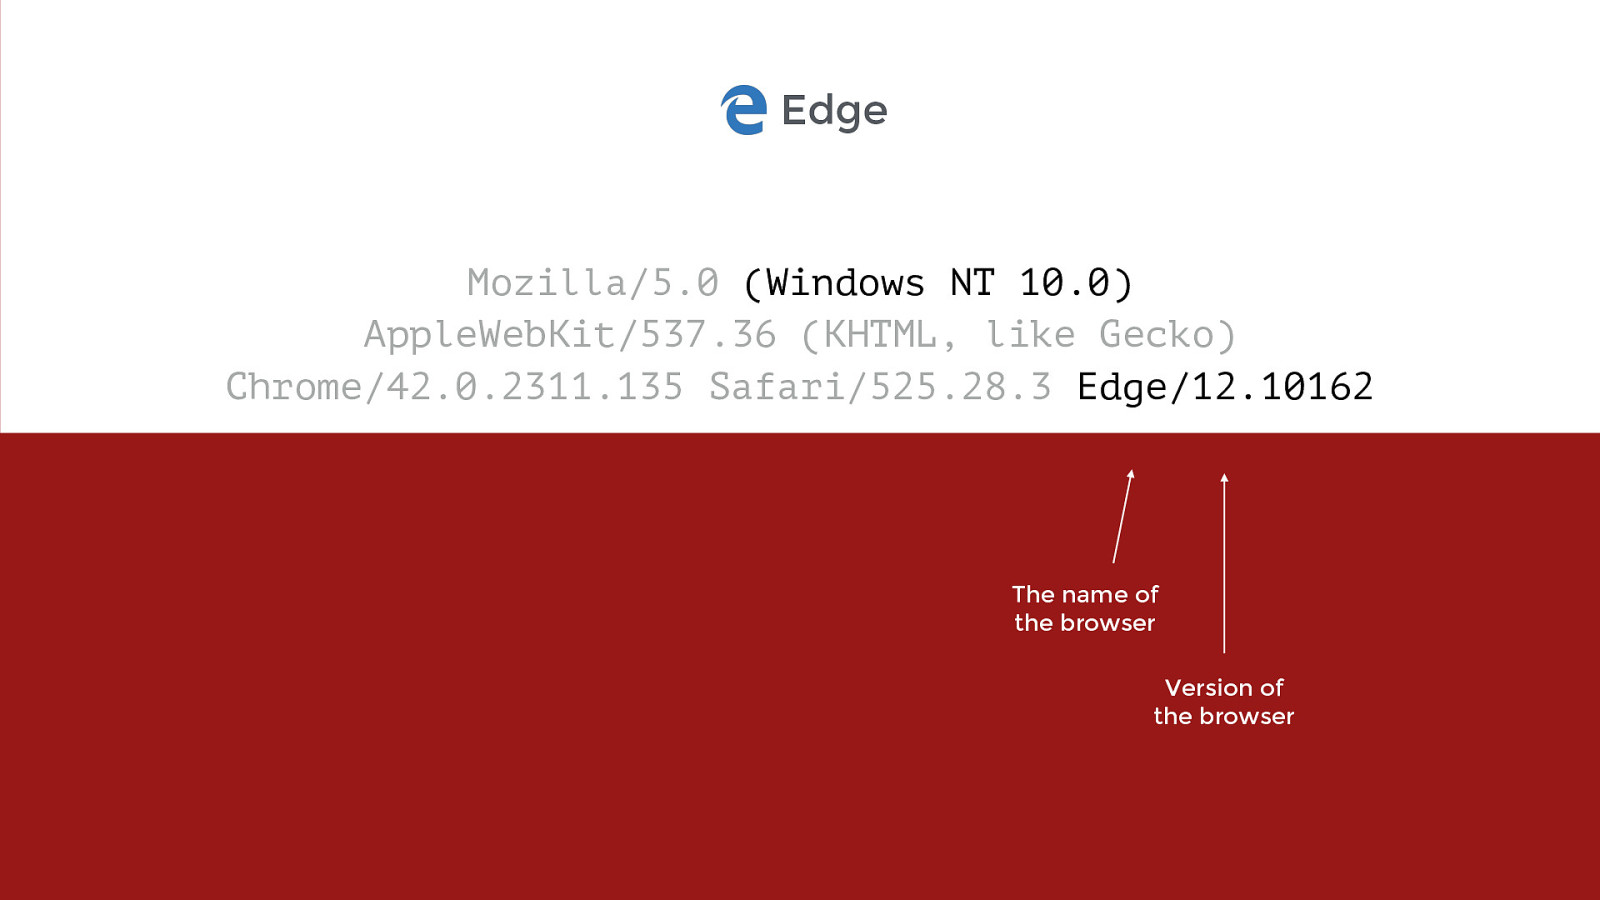 mozilla/5.0 (windows nt 6.1 wow64) applewebkit/537.36 (khtml